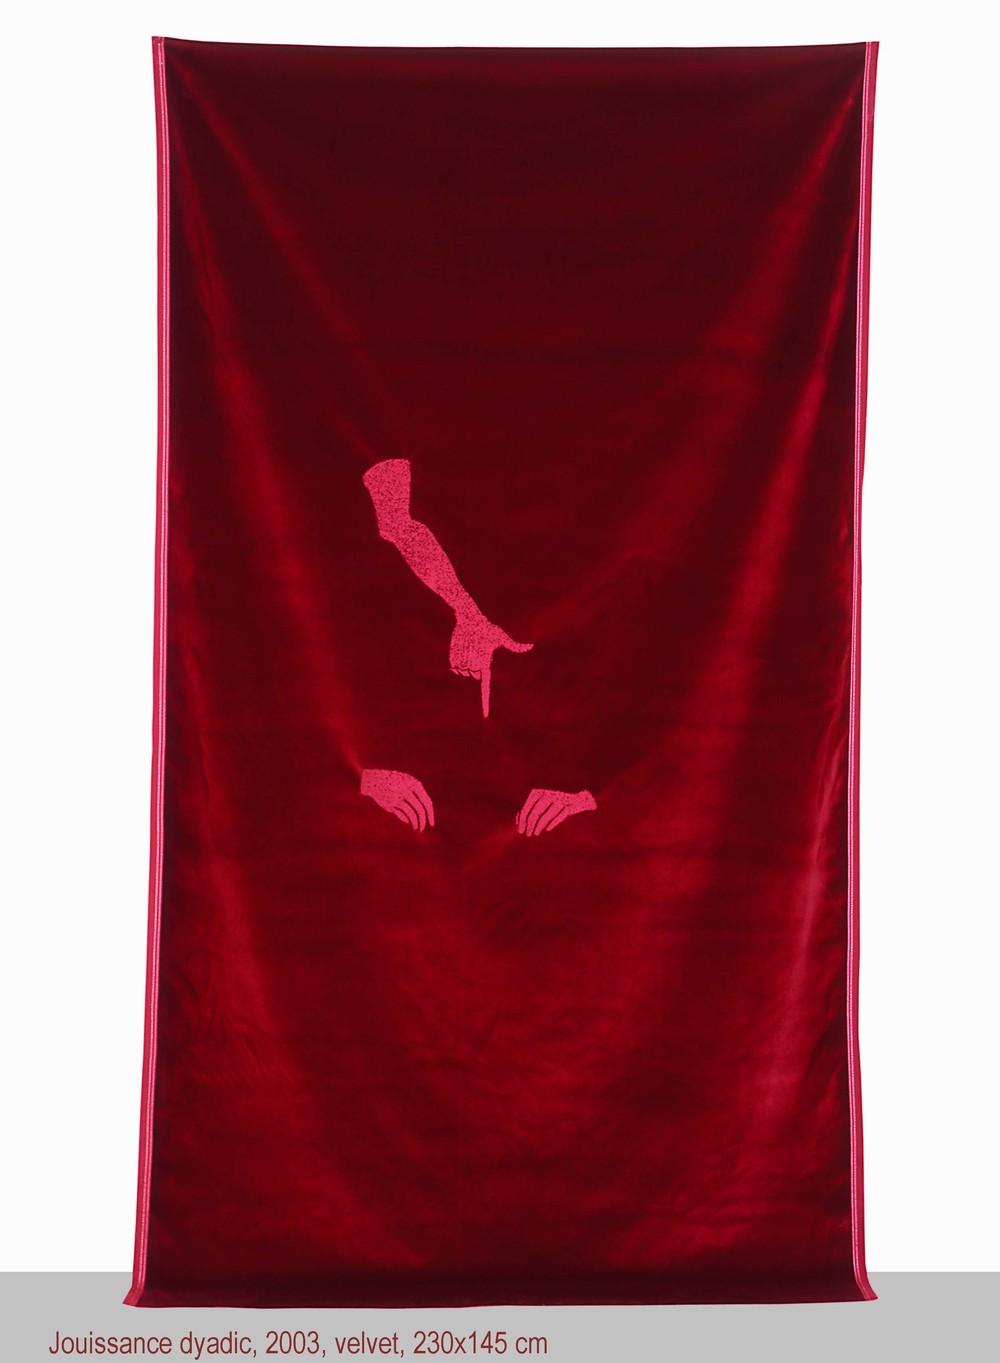 Maro Michalakakos   Jouissance Dyadic   2003  Velvet  109 x 56 inches